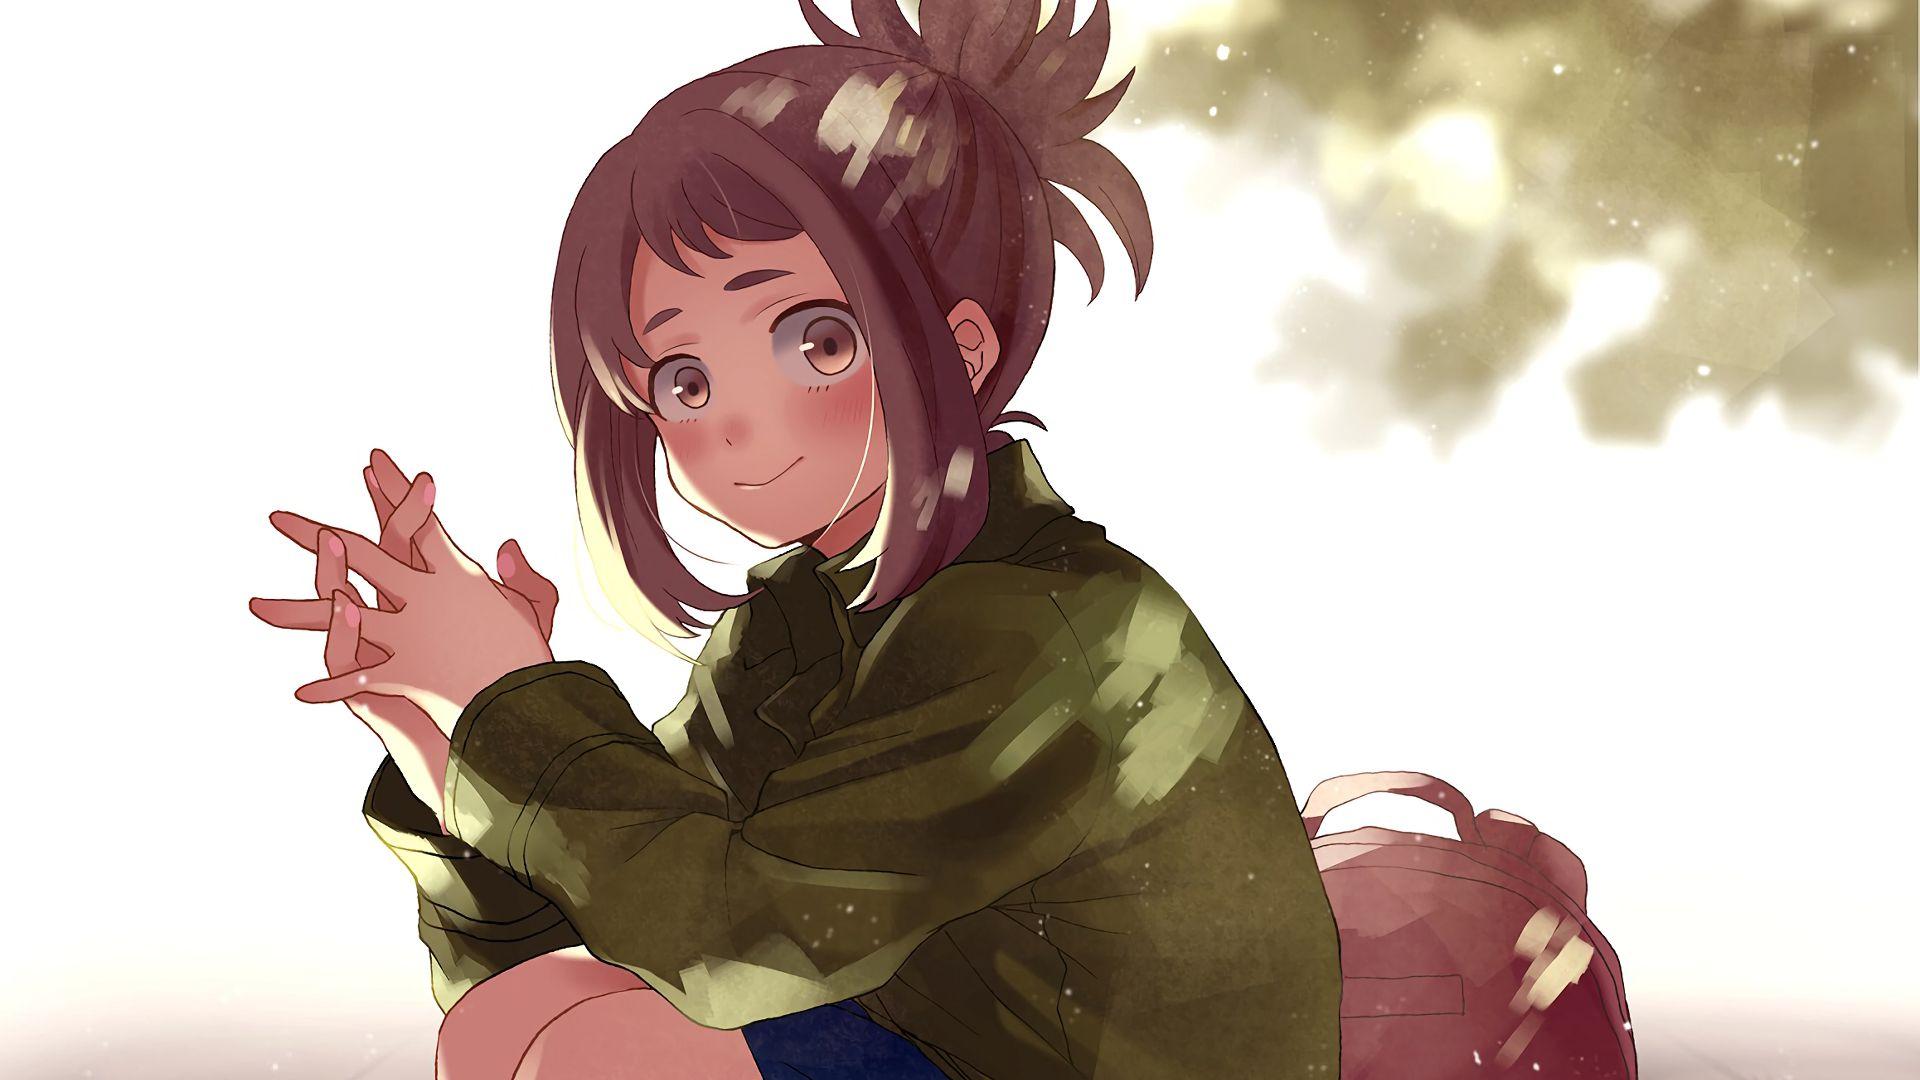 Cute Girl Hd Wallpaper For Laptop Desktop Wallpaper Cute Anime Girl Ochako Uraraka Boku